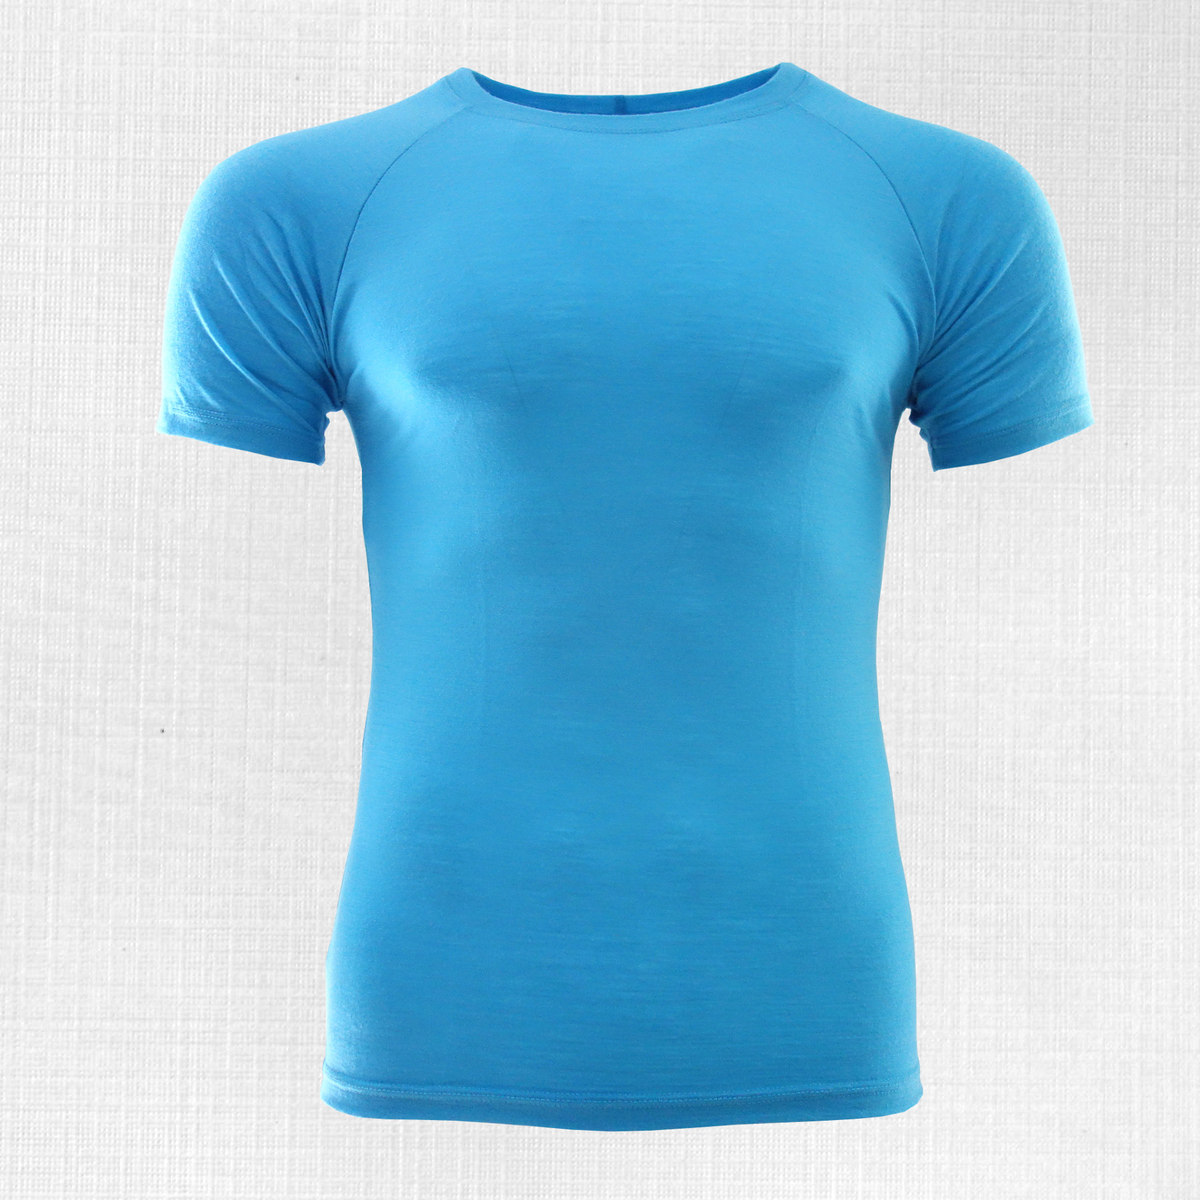 4fcf6ee3dc4b Pánske funkčné tričko Kamenec